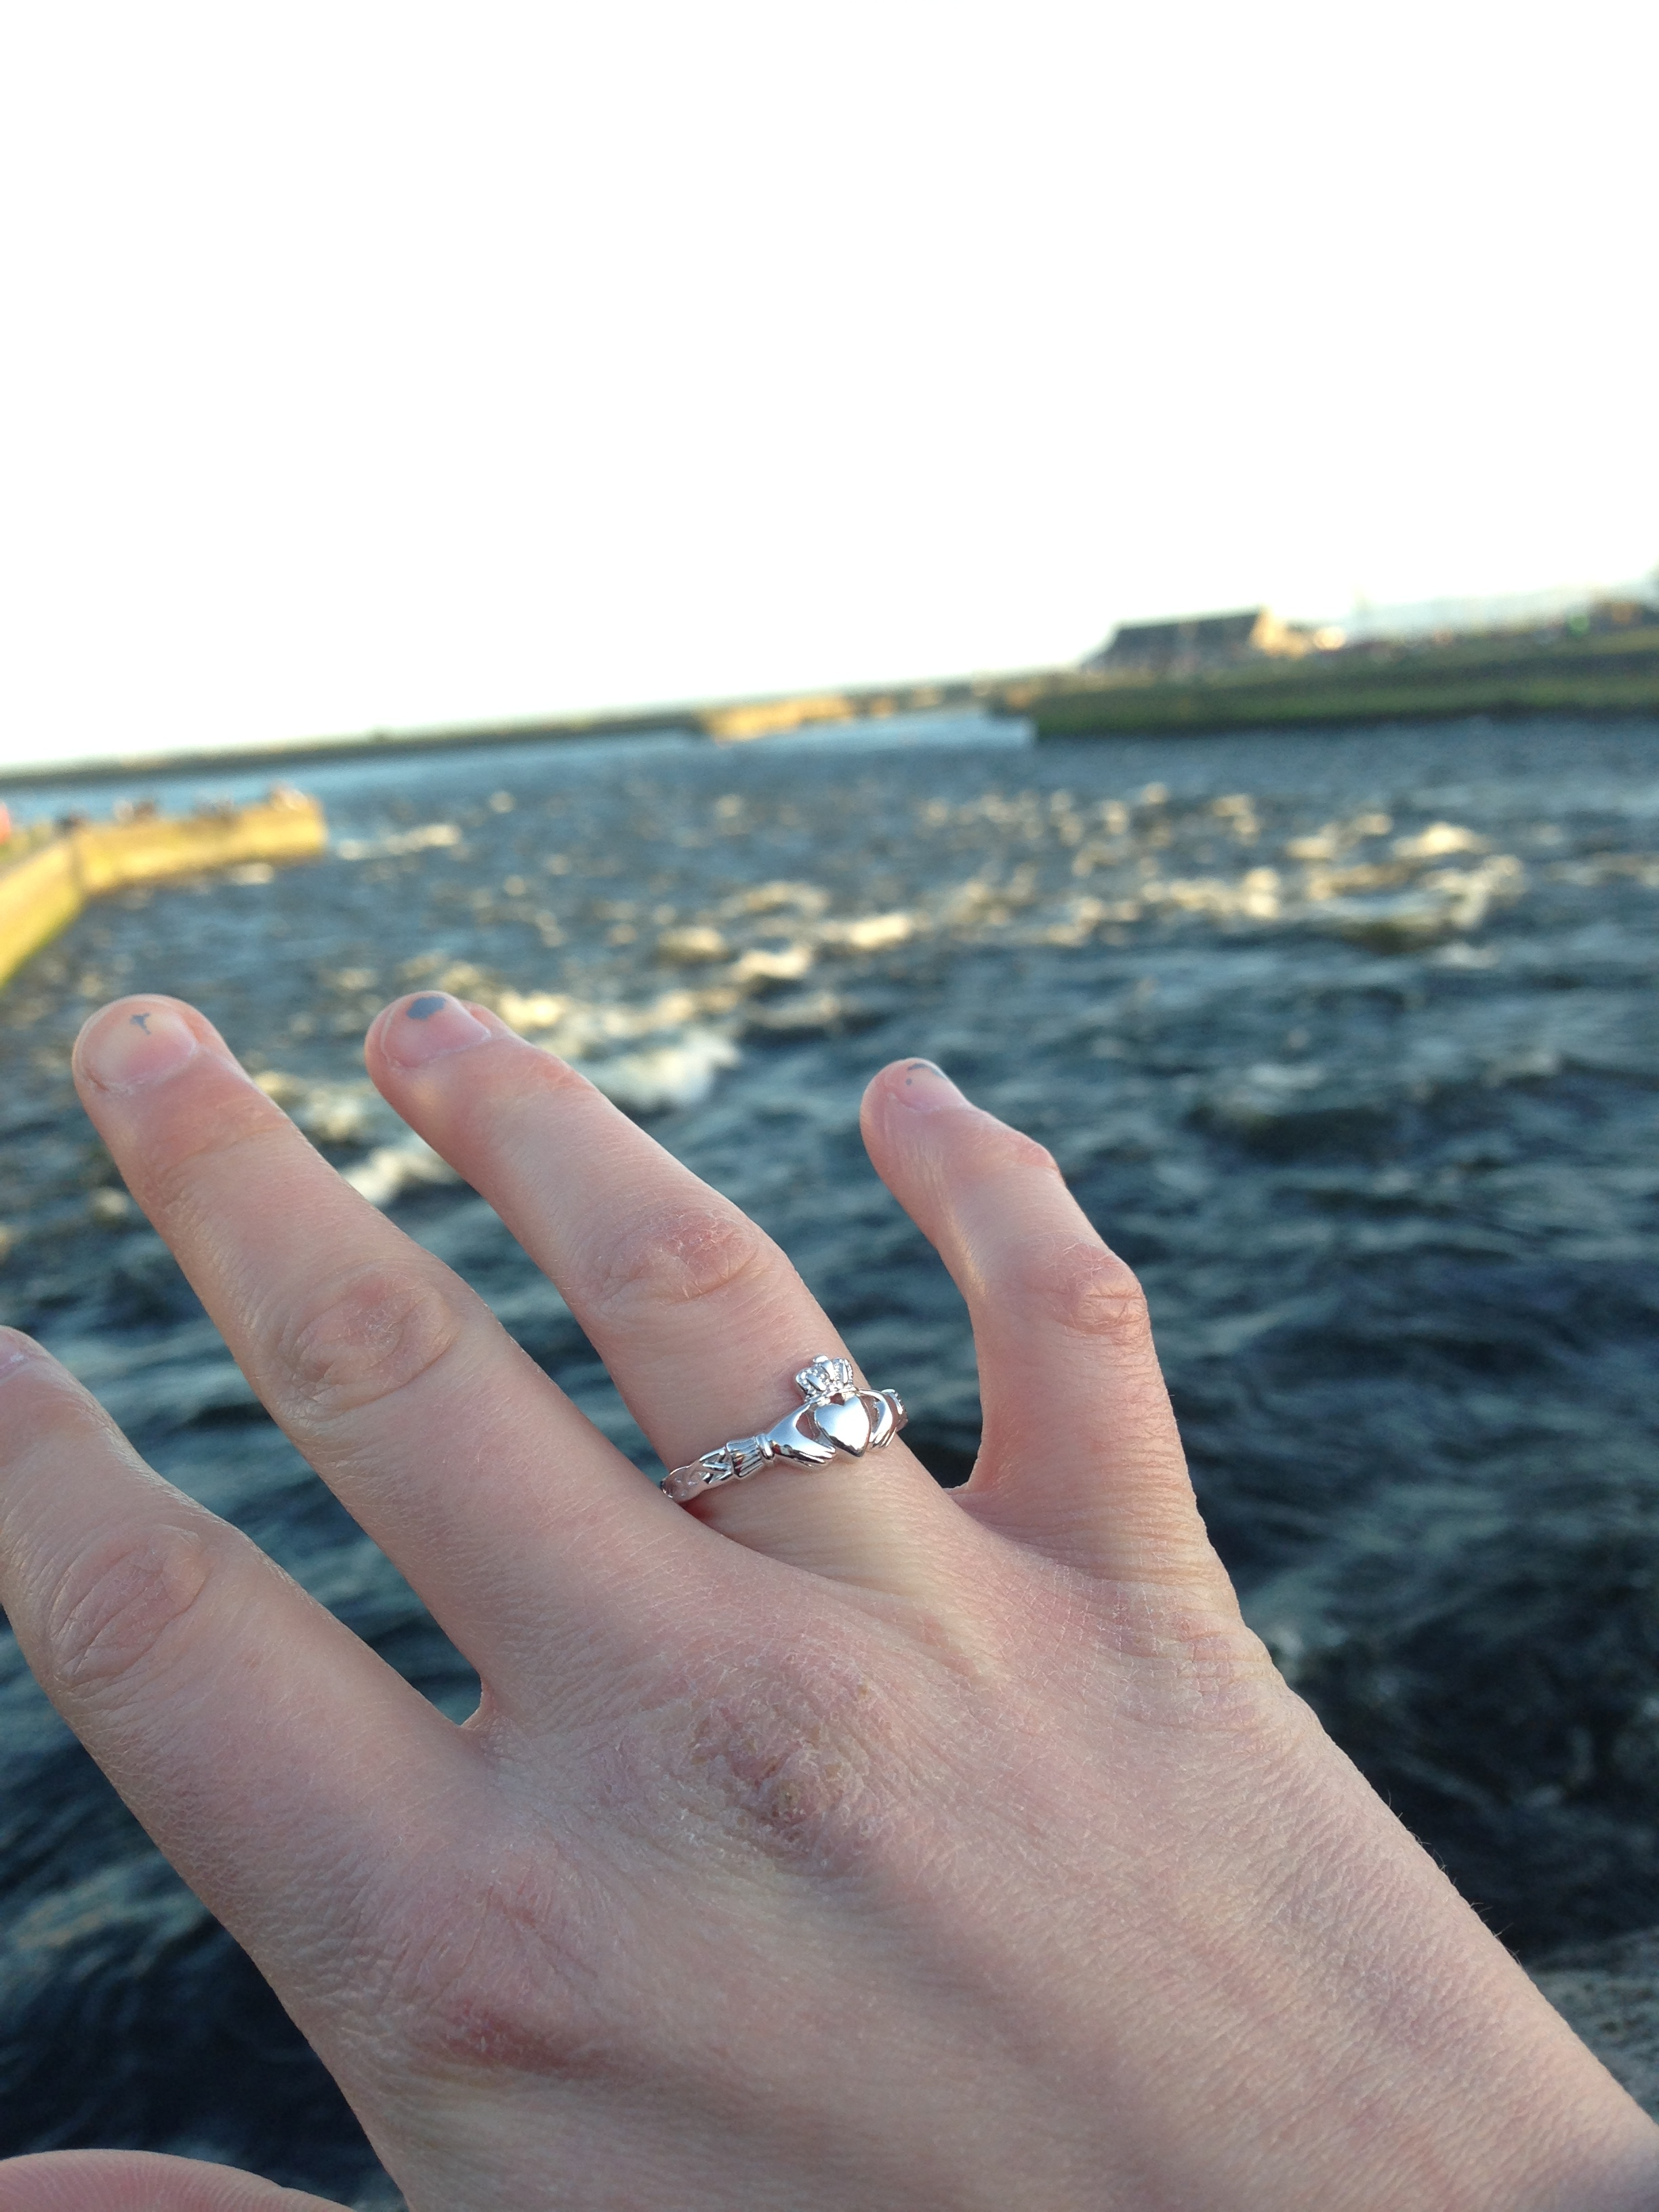 I said yes!!